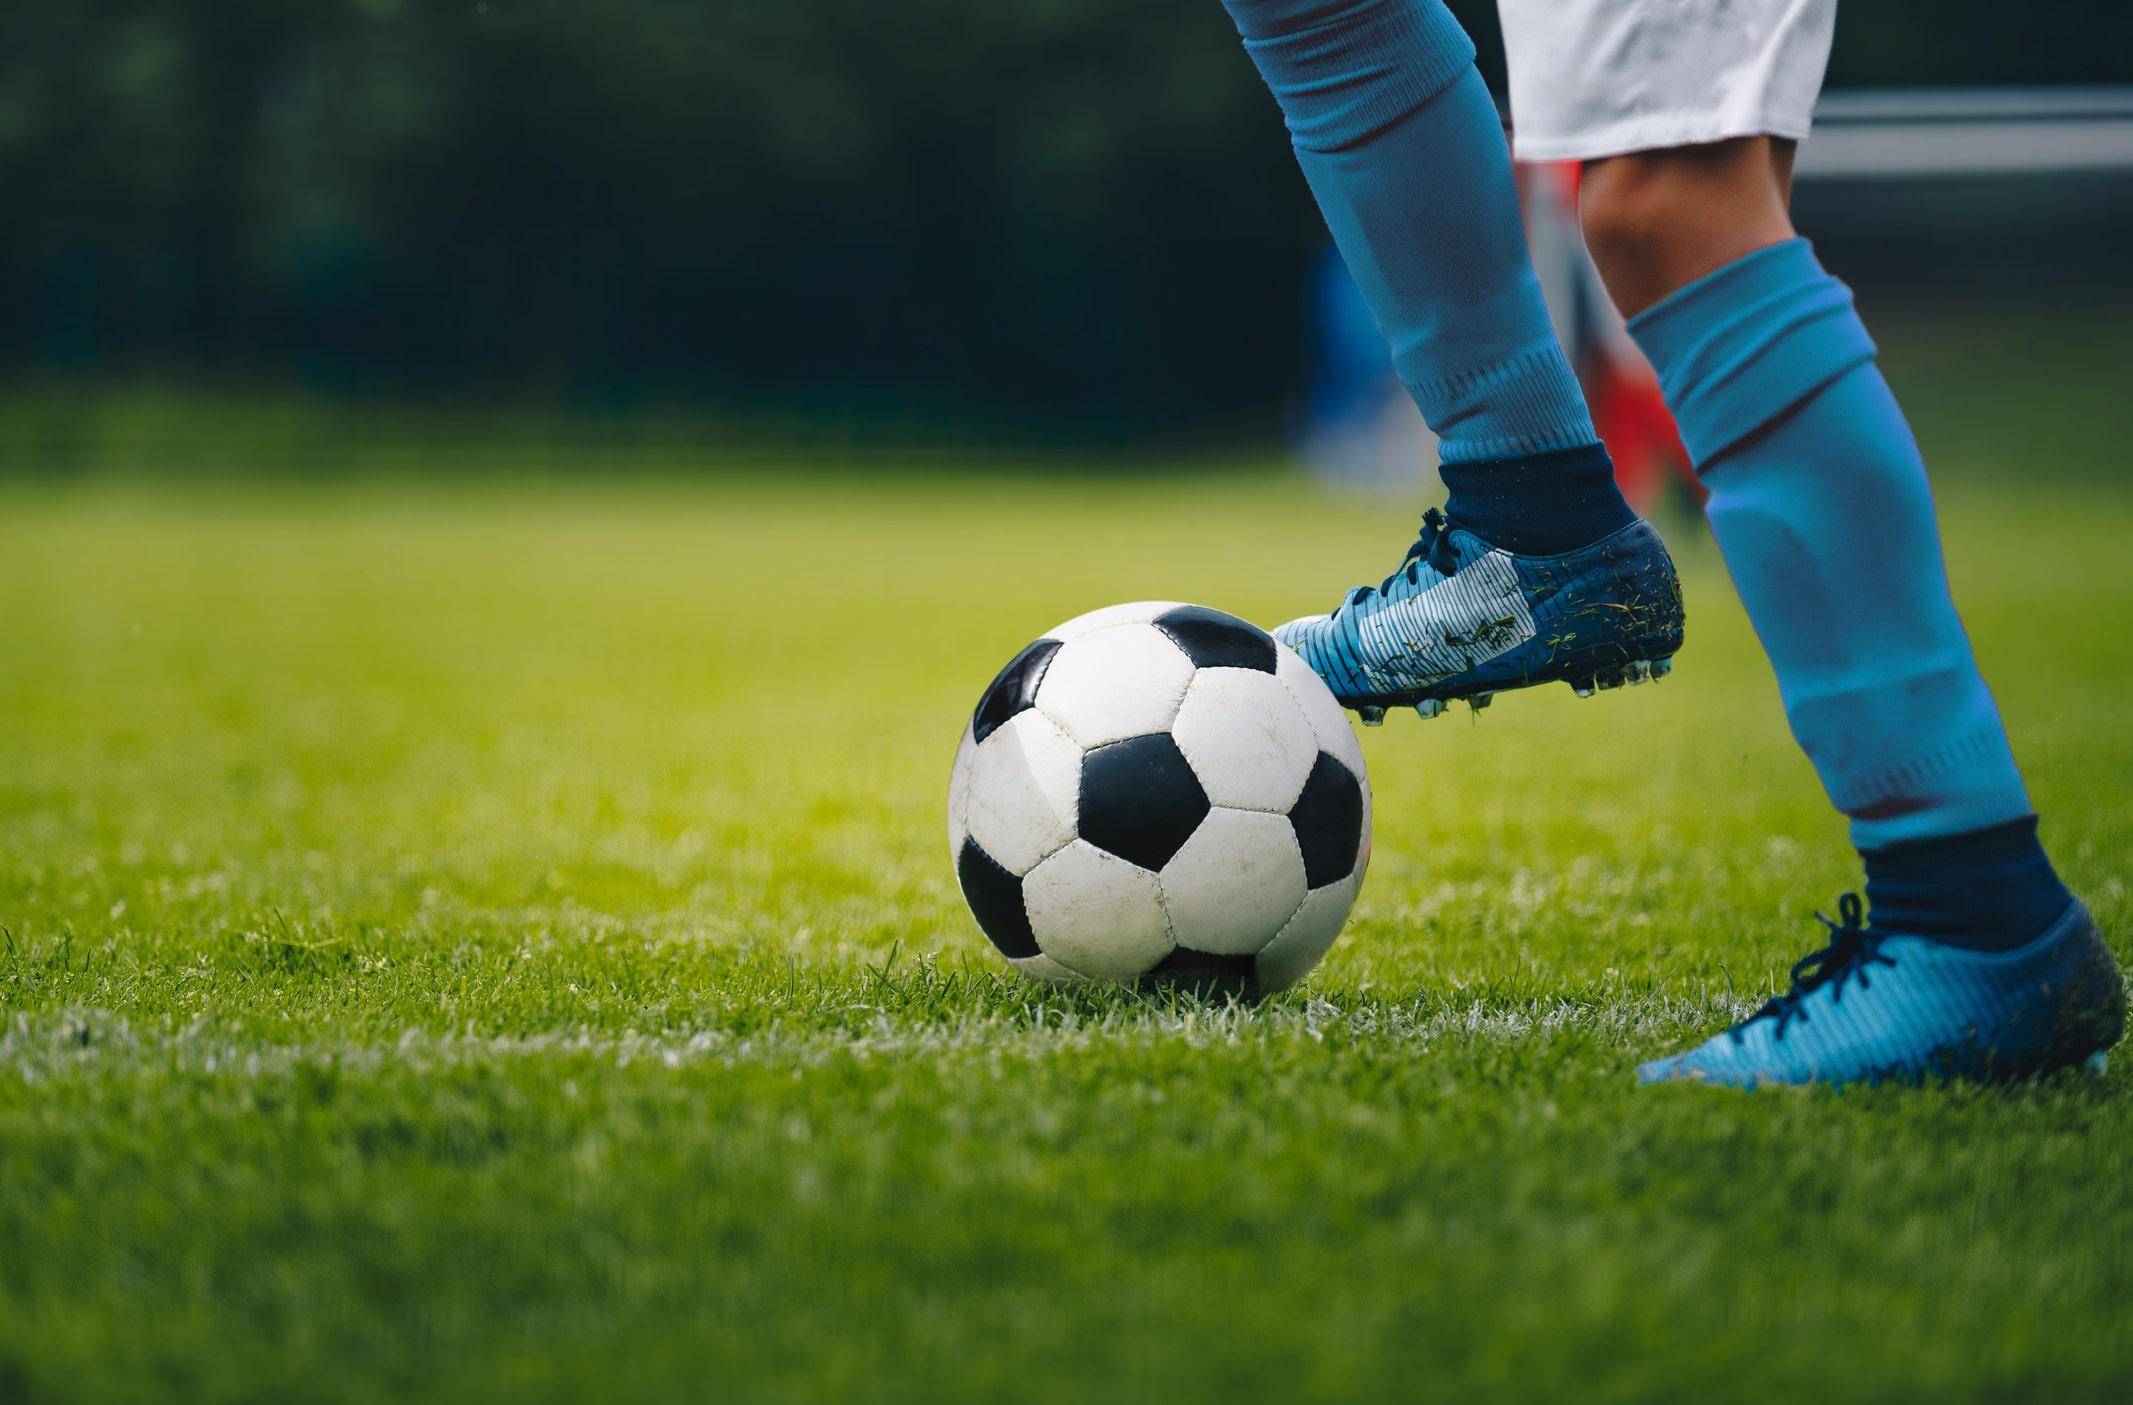 Plane crash kills 4 soccer players, club president in Brazil - fox